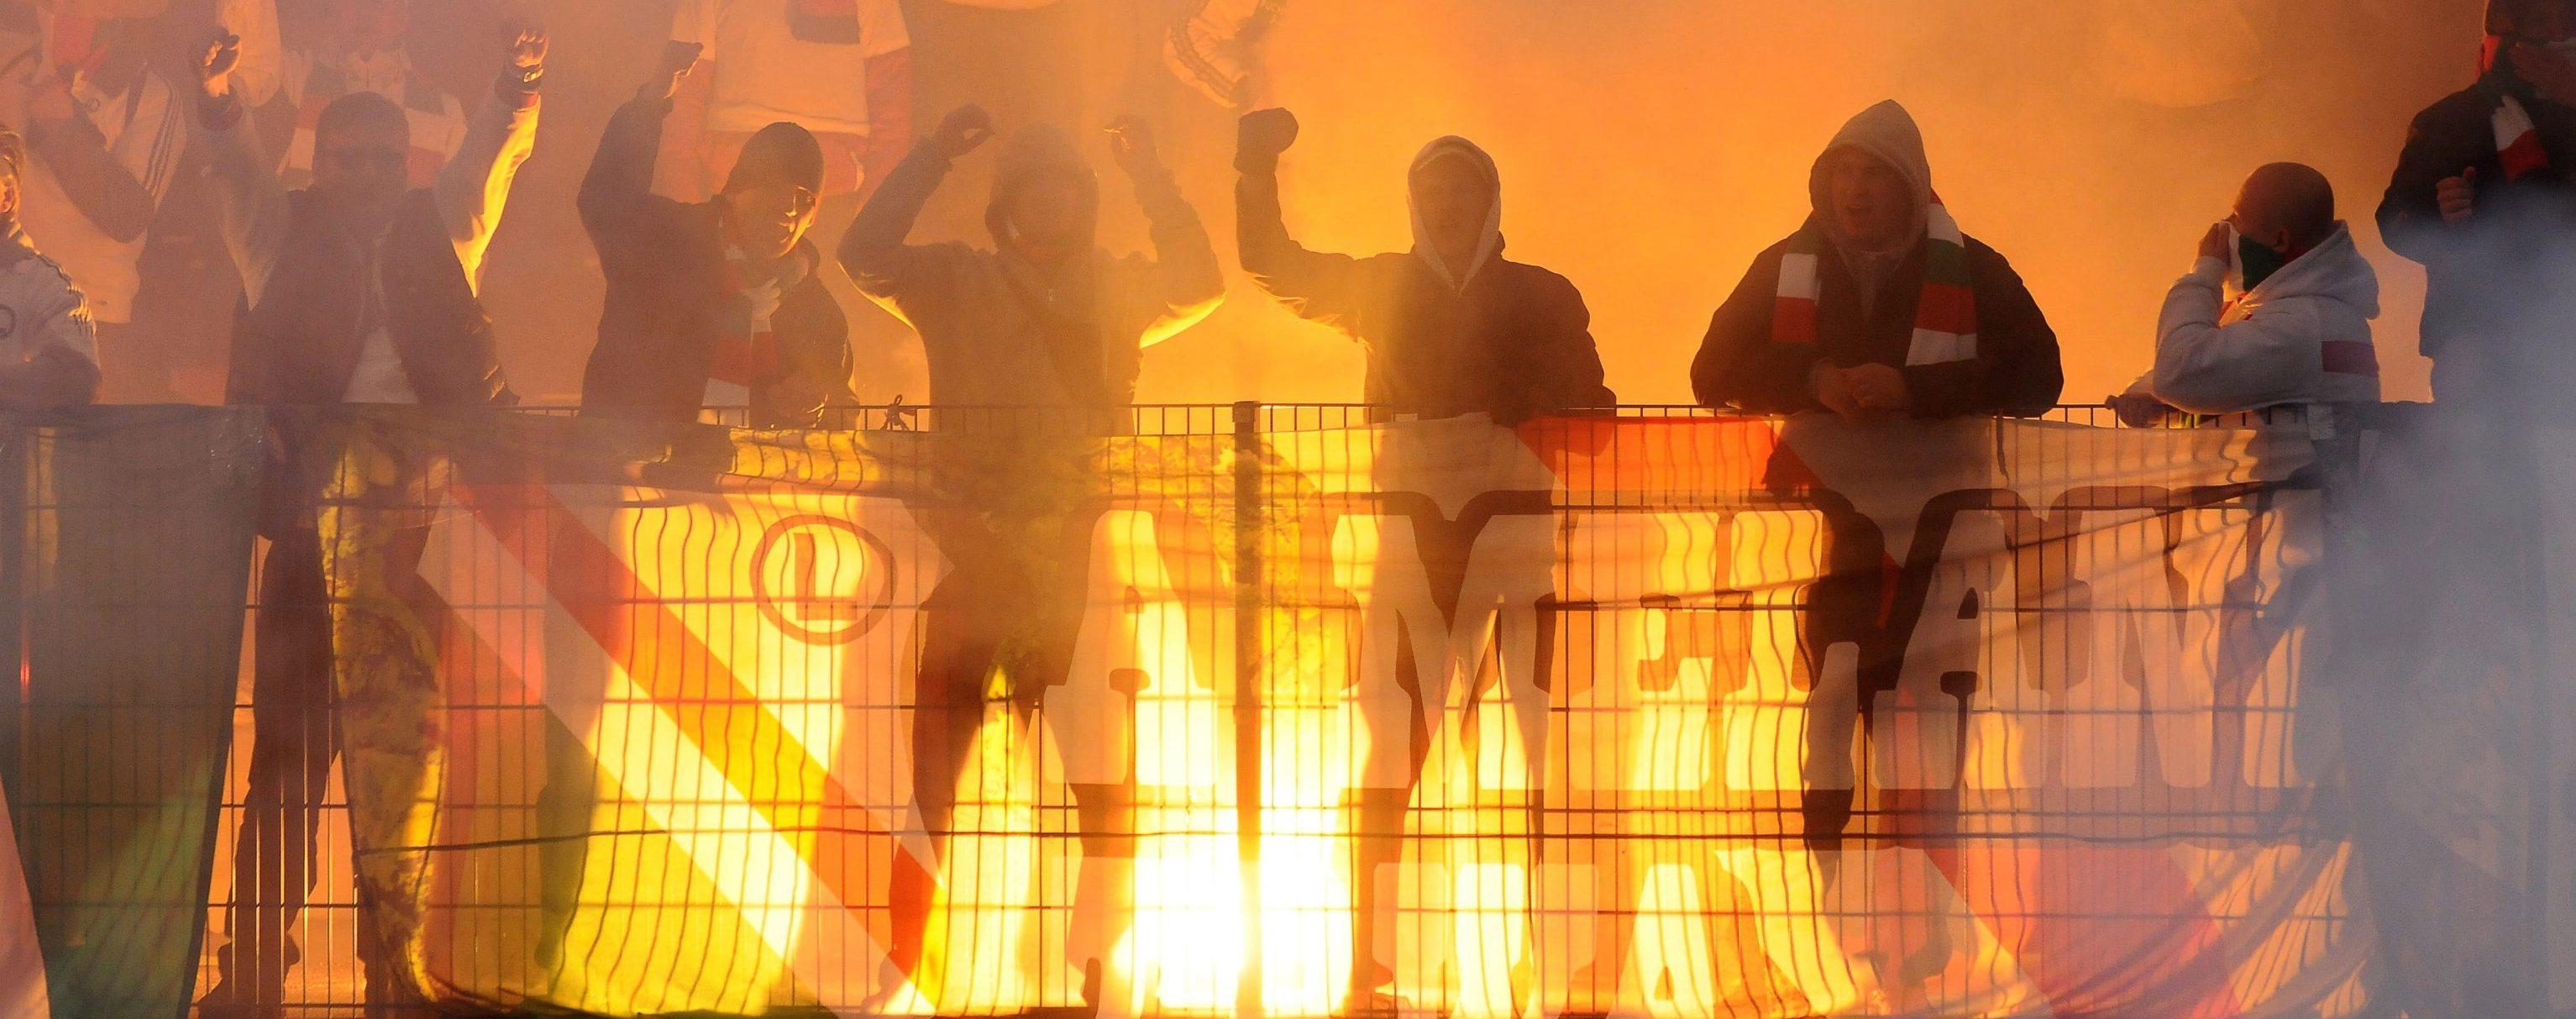 Hooligans in azione